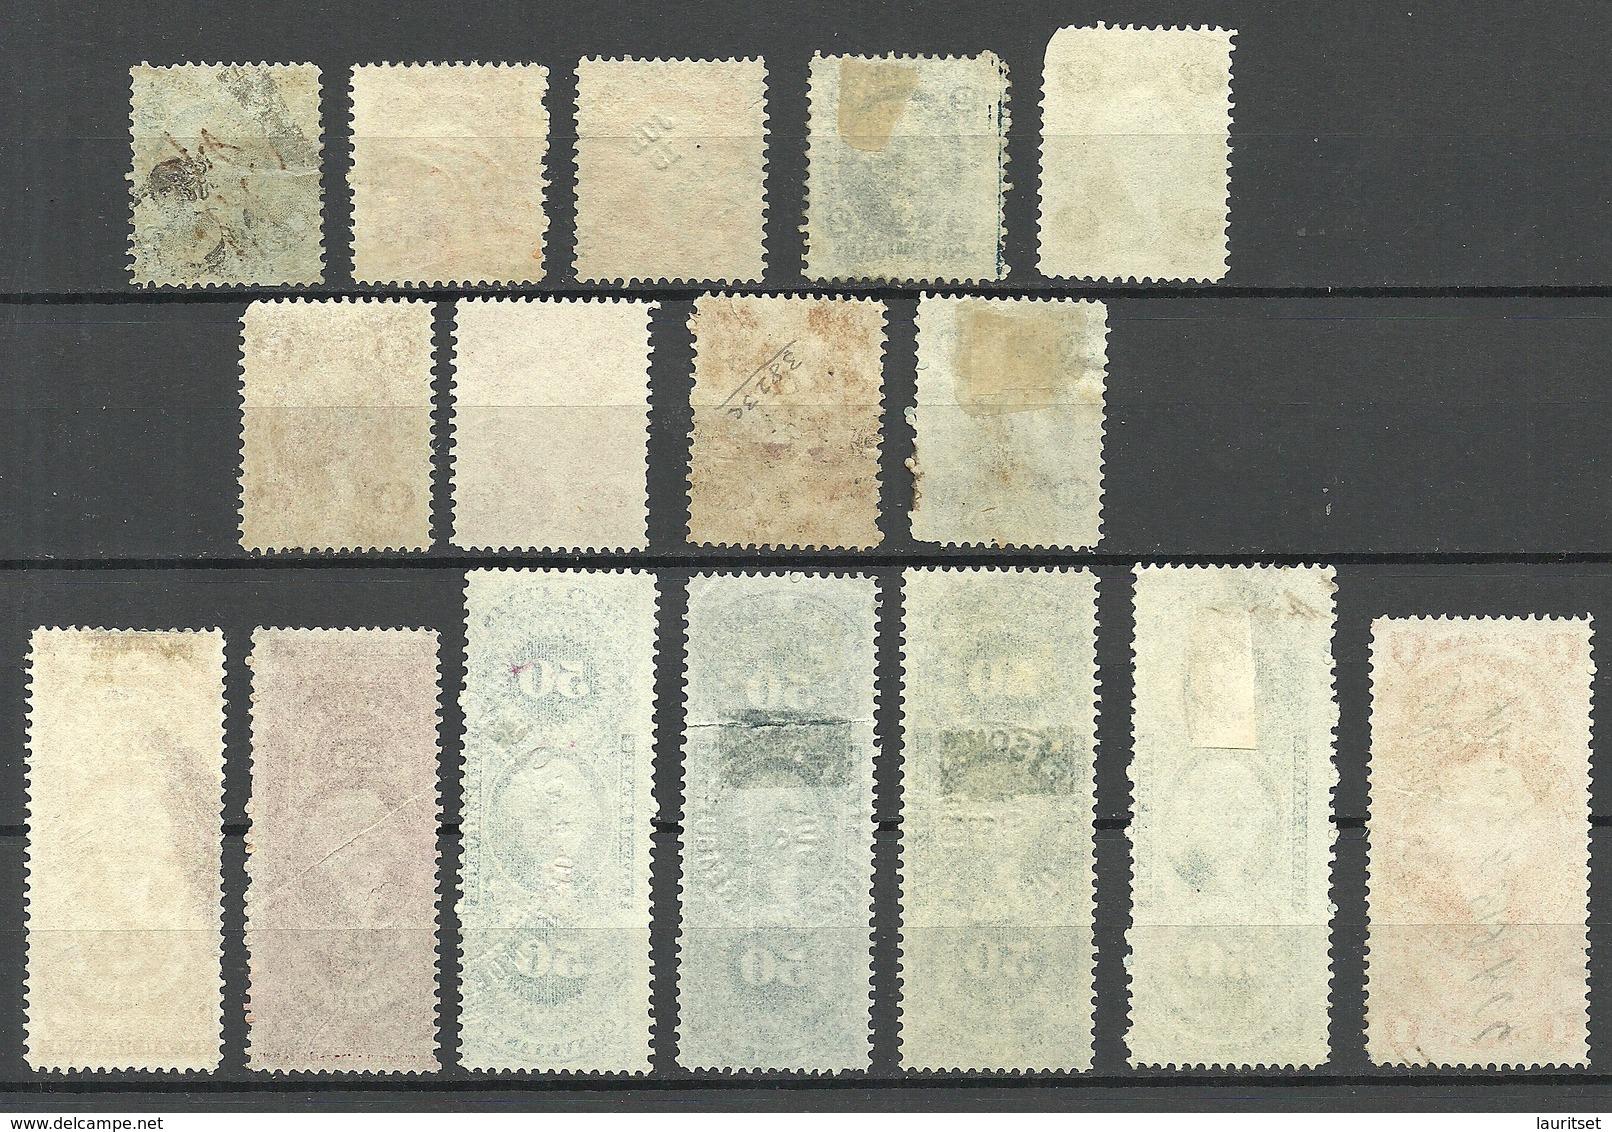 USA 1860ies Internal Revenue Tax Washington Incl Color Varieties Different Printings O - Revenues